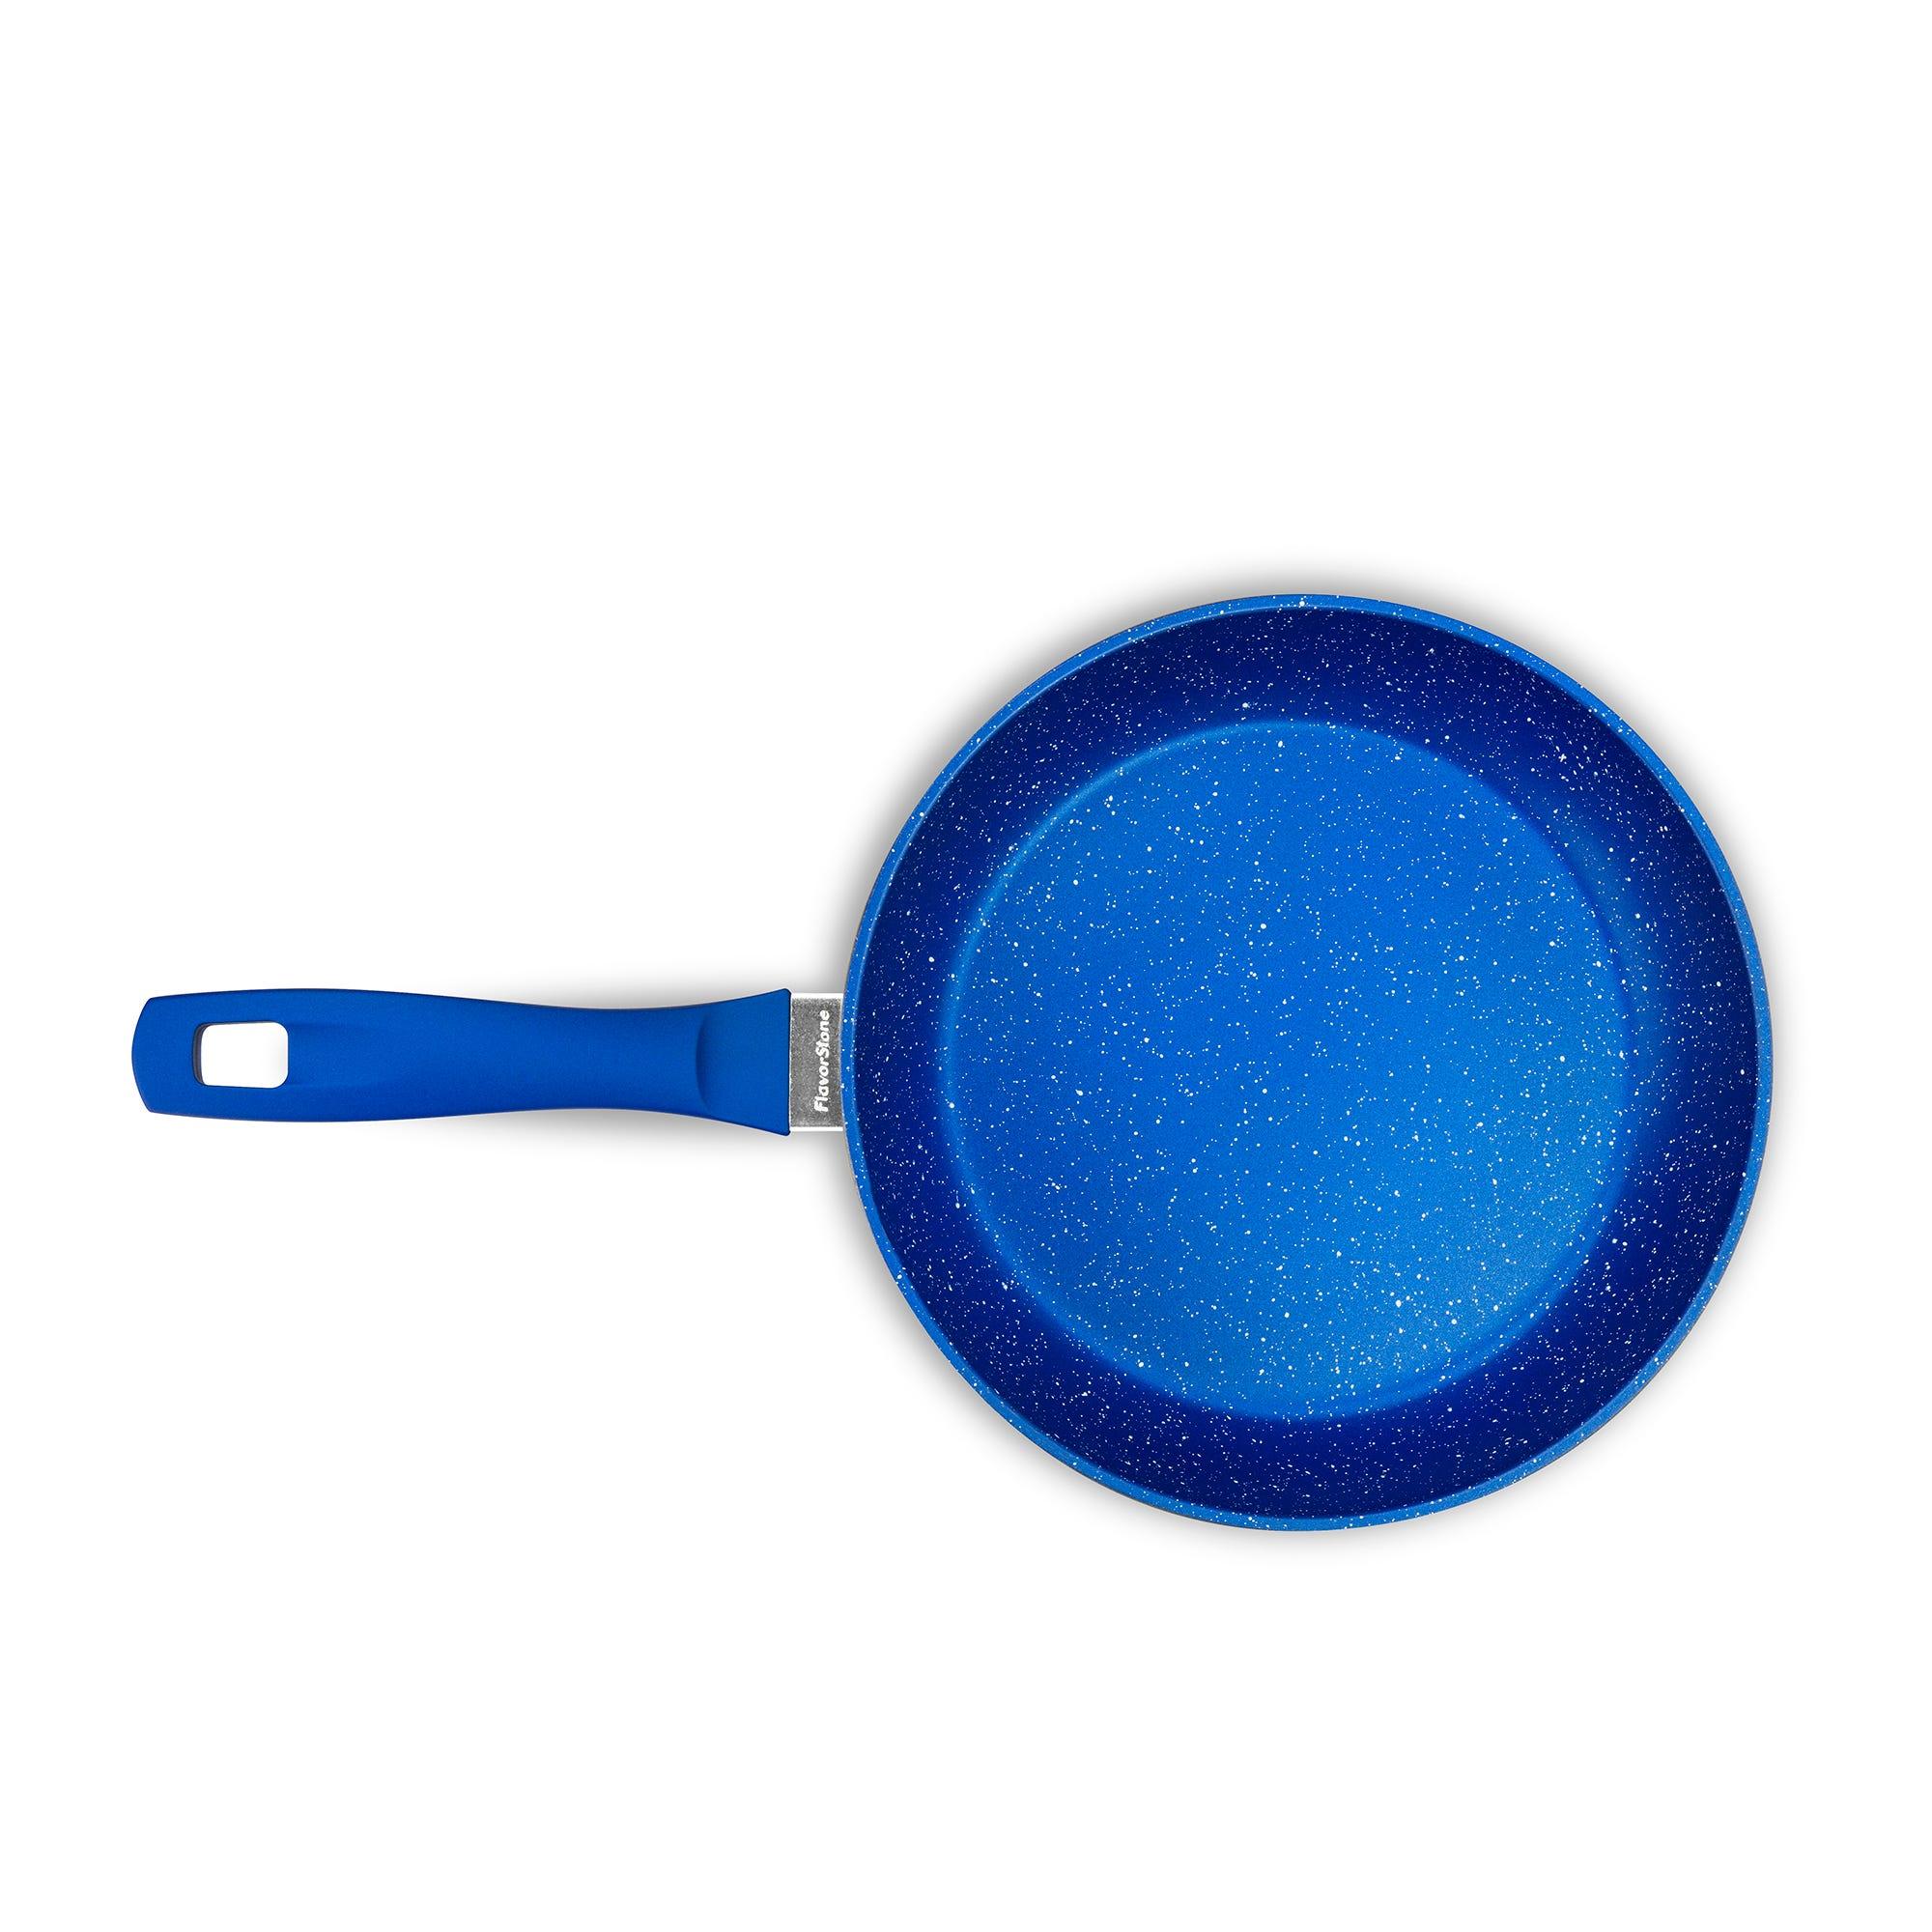 Sartén antiadherente para saltear Flavor Stone de 20 cm color azul